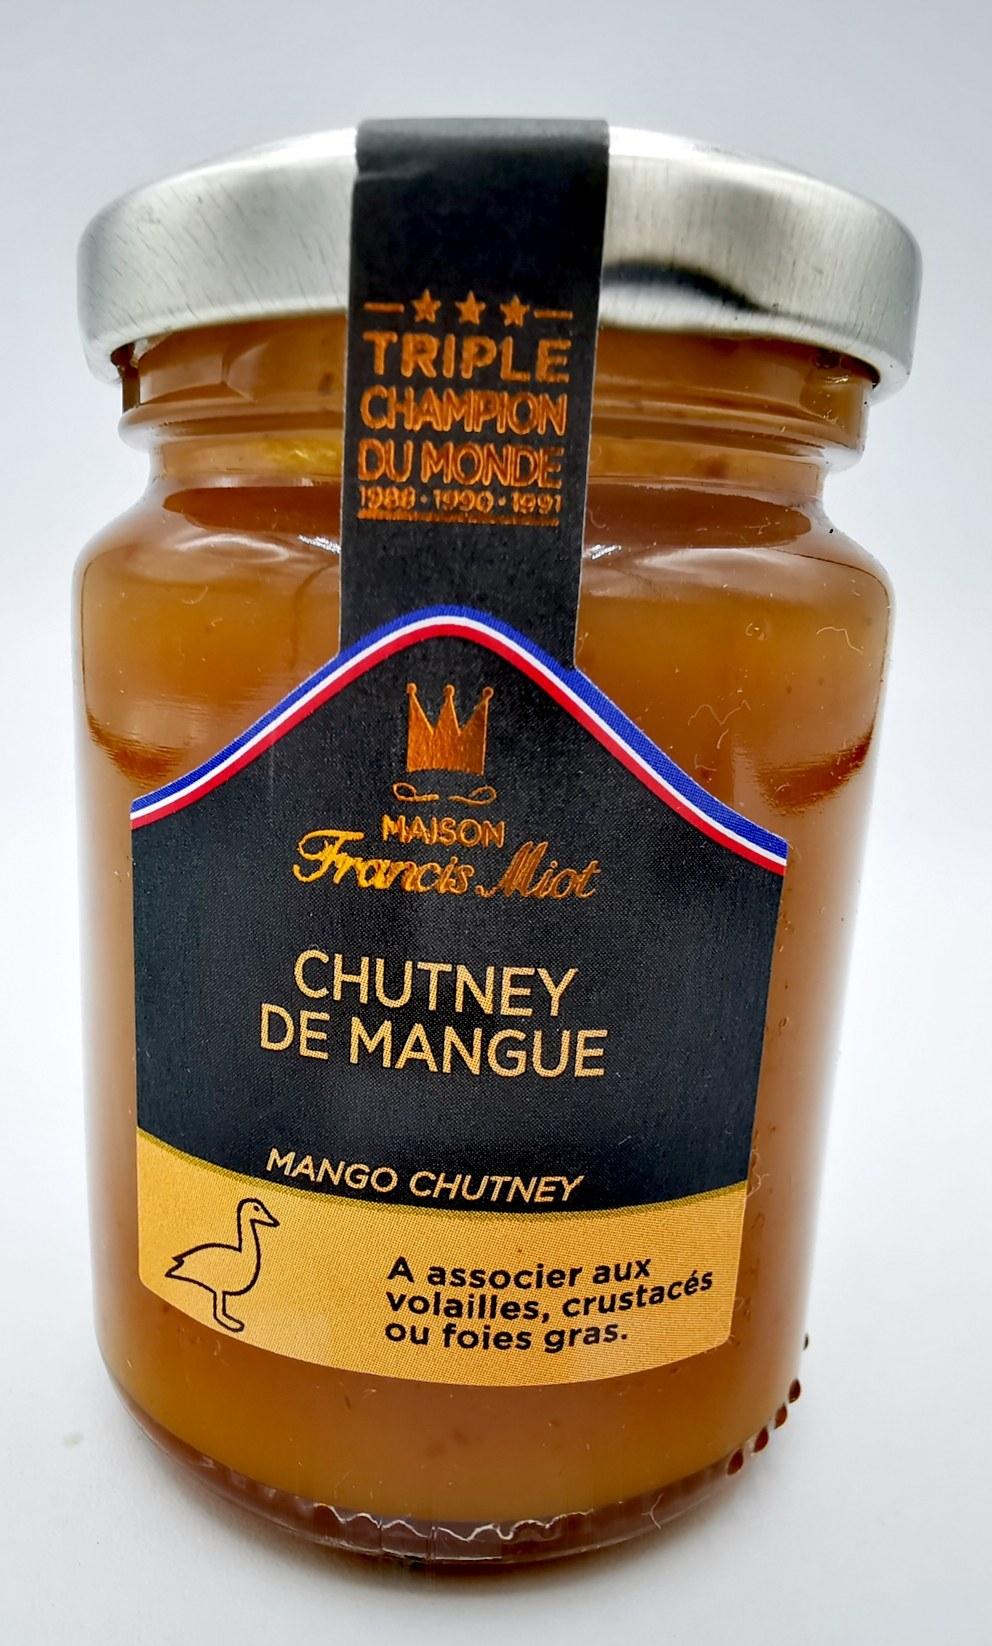 Chutney de mangue - Francis Miot - chutney - vallée d'aspe - saveurs associées